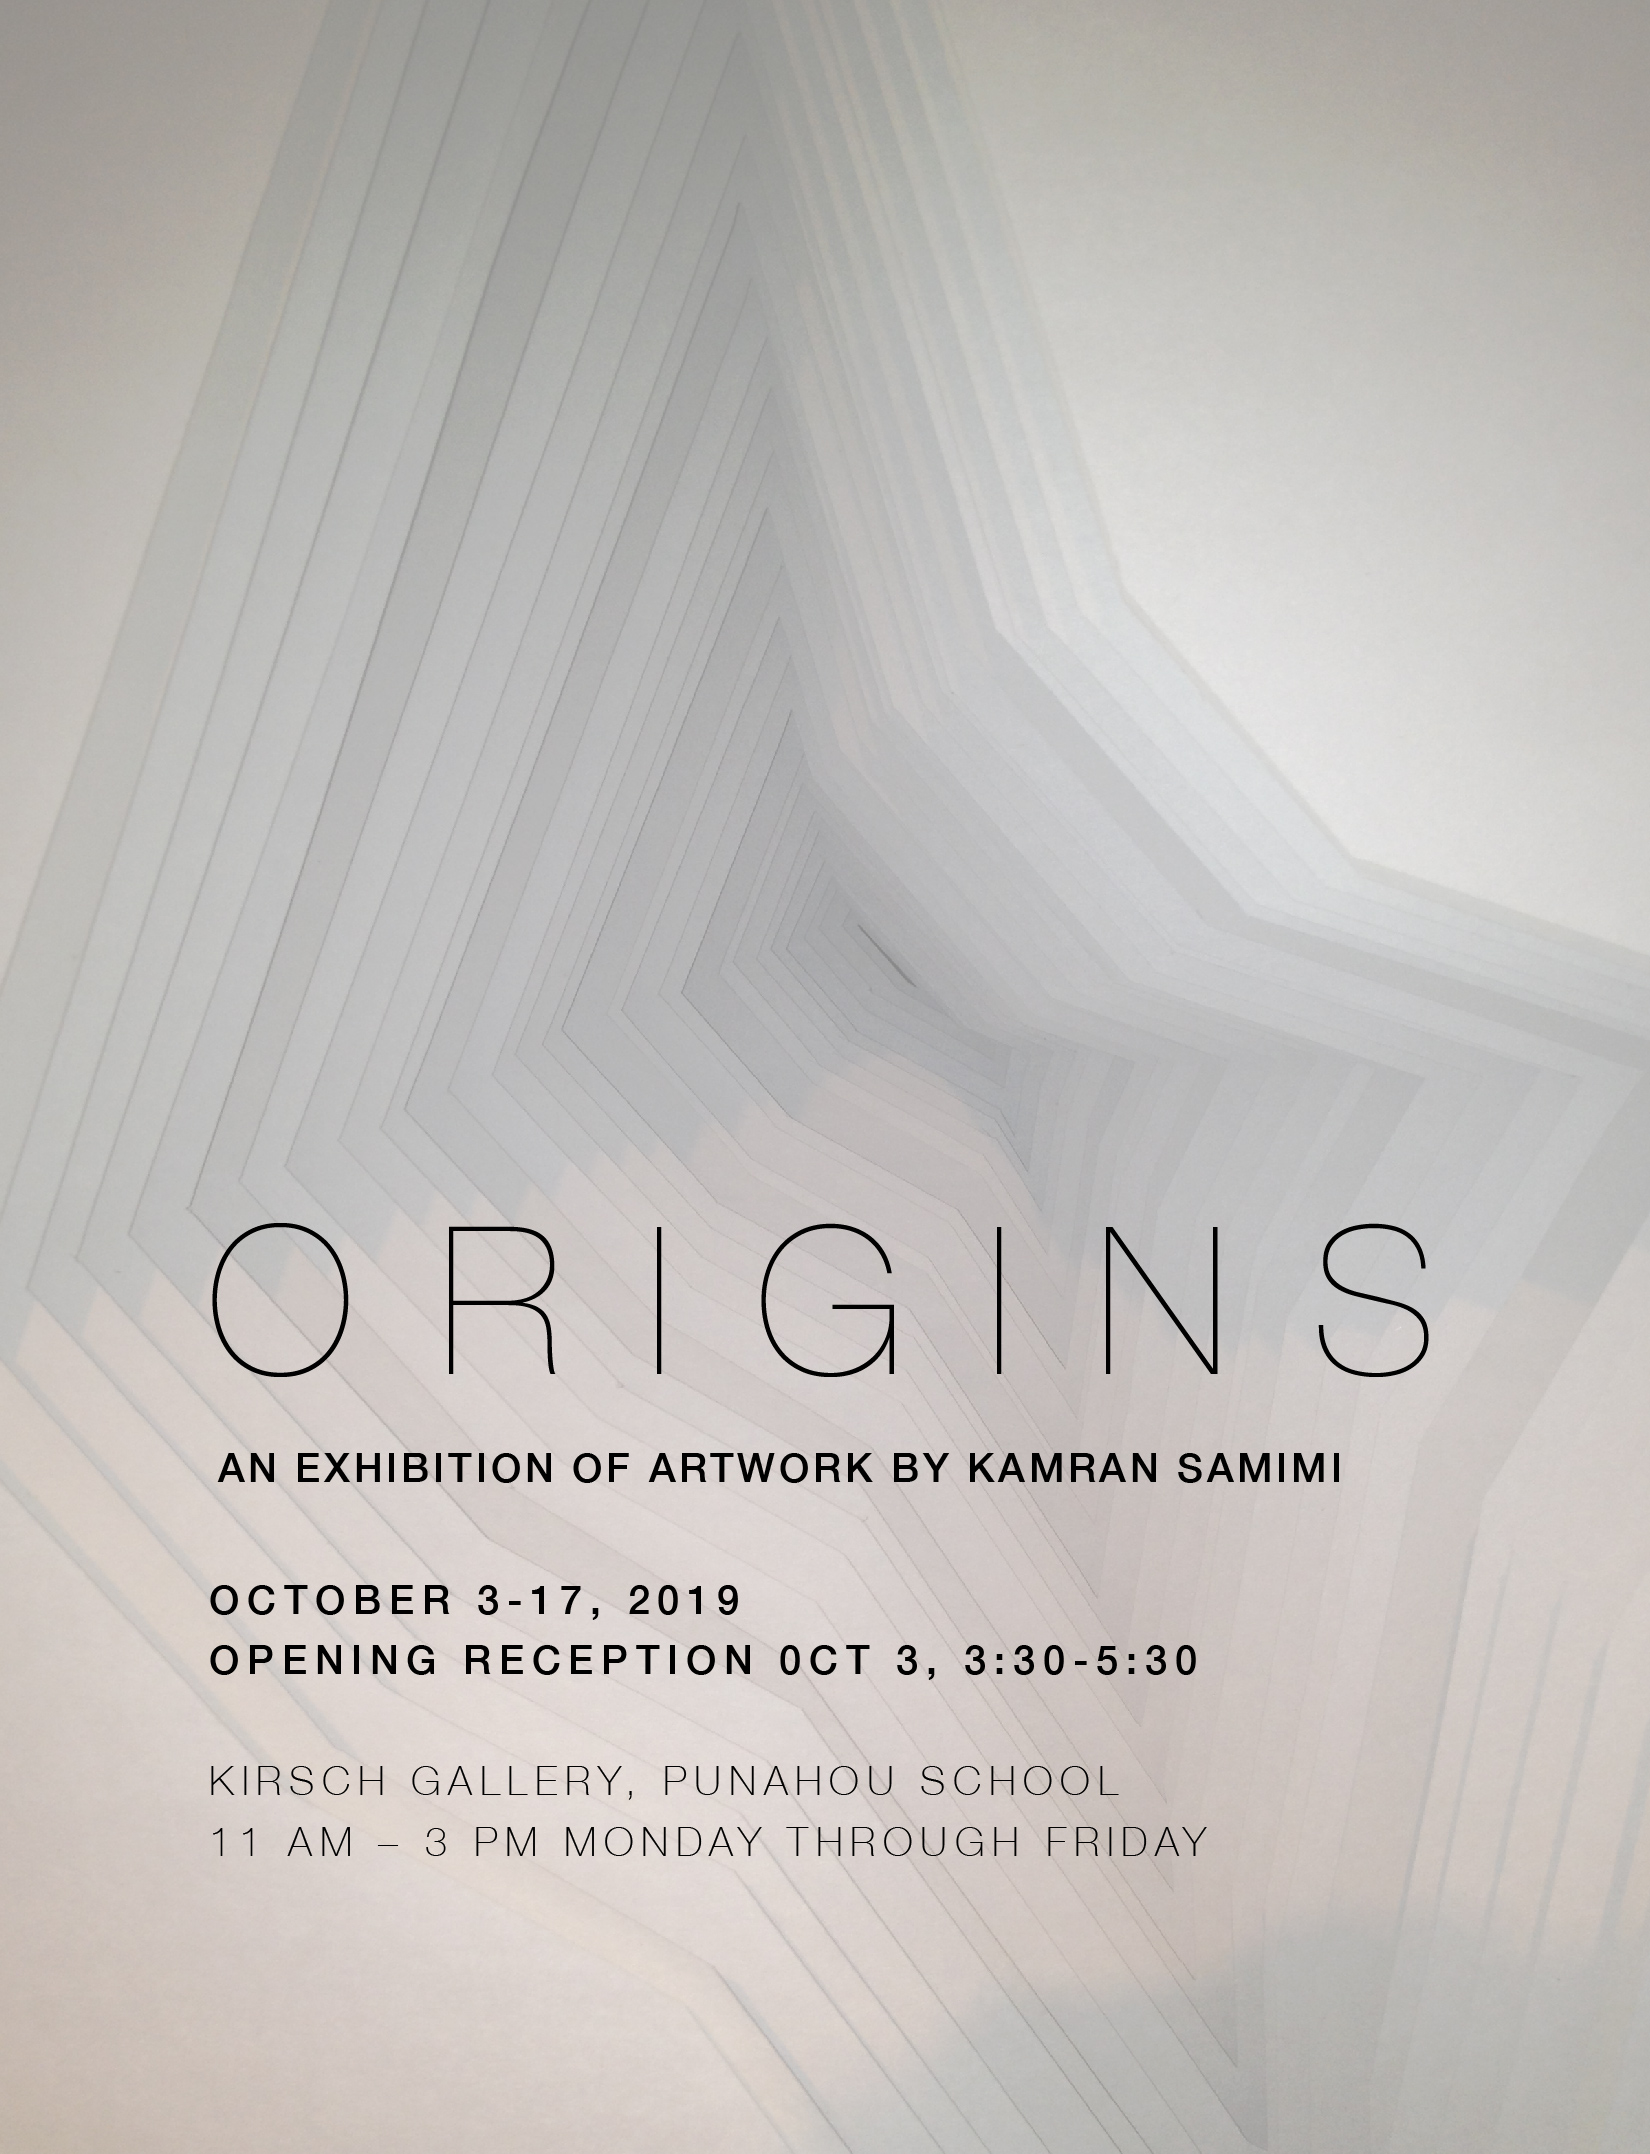 origins_flyer-01.jpg